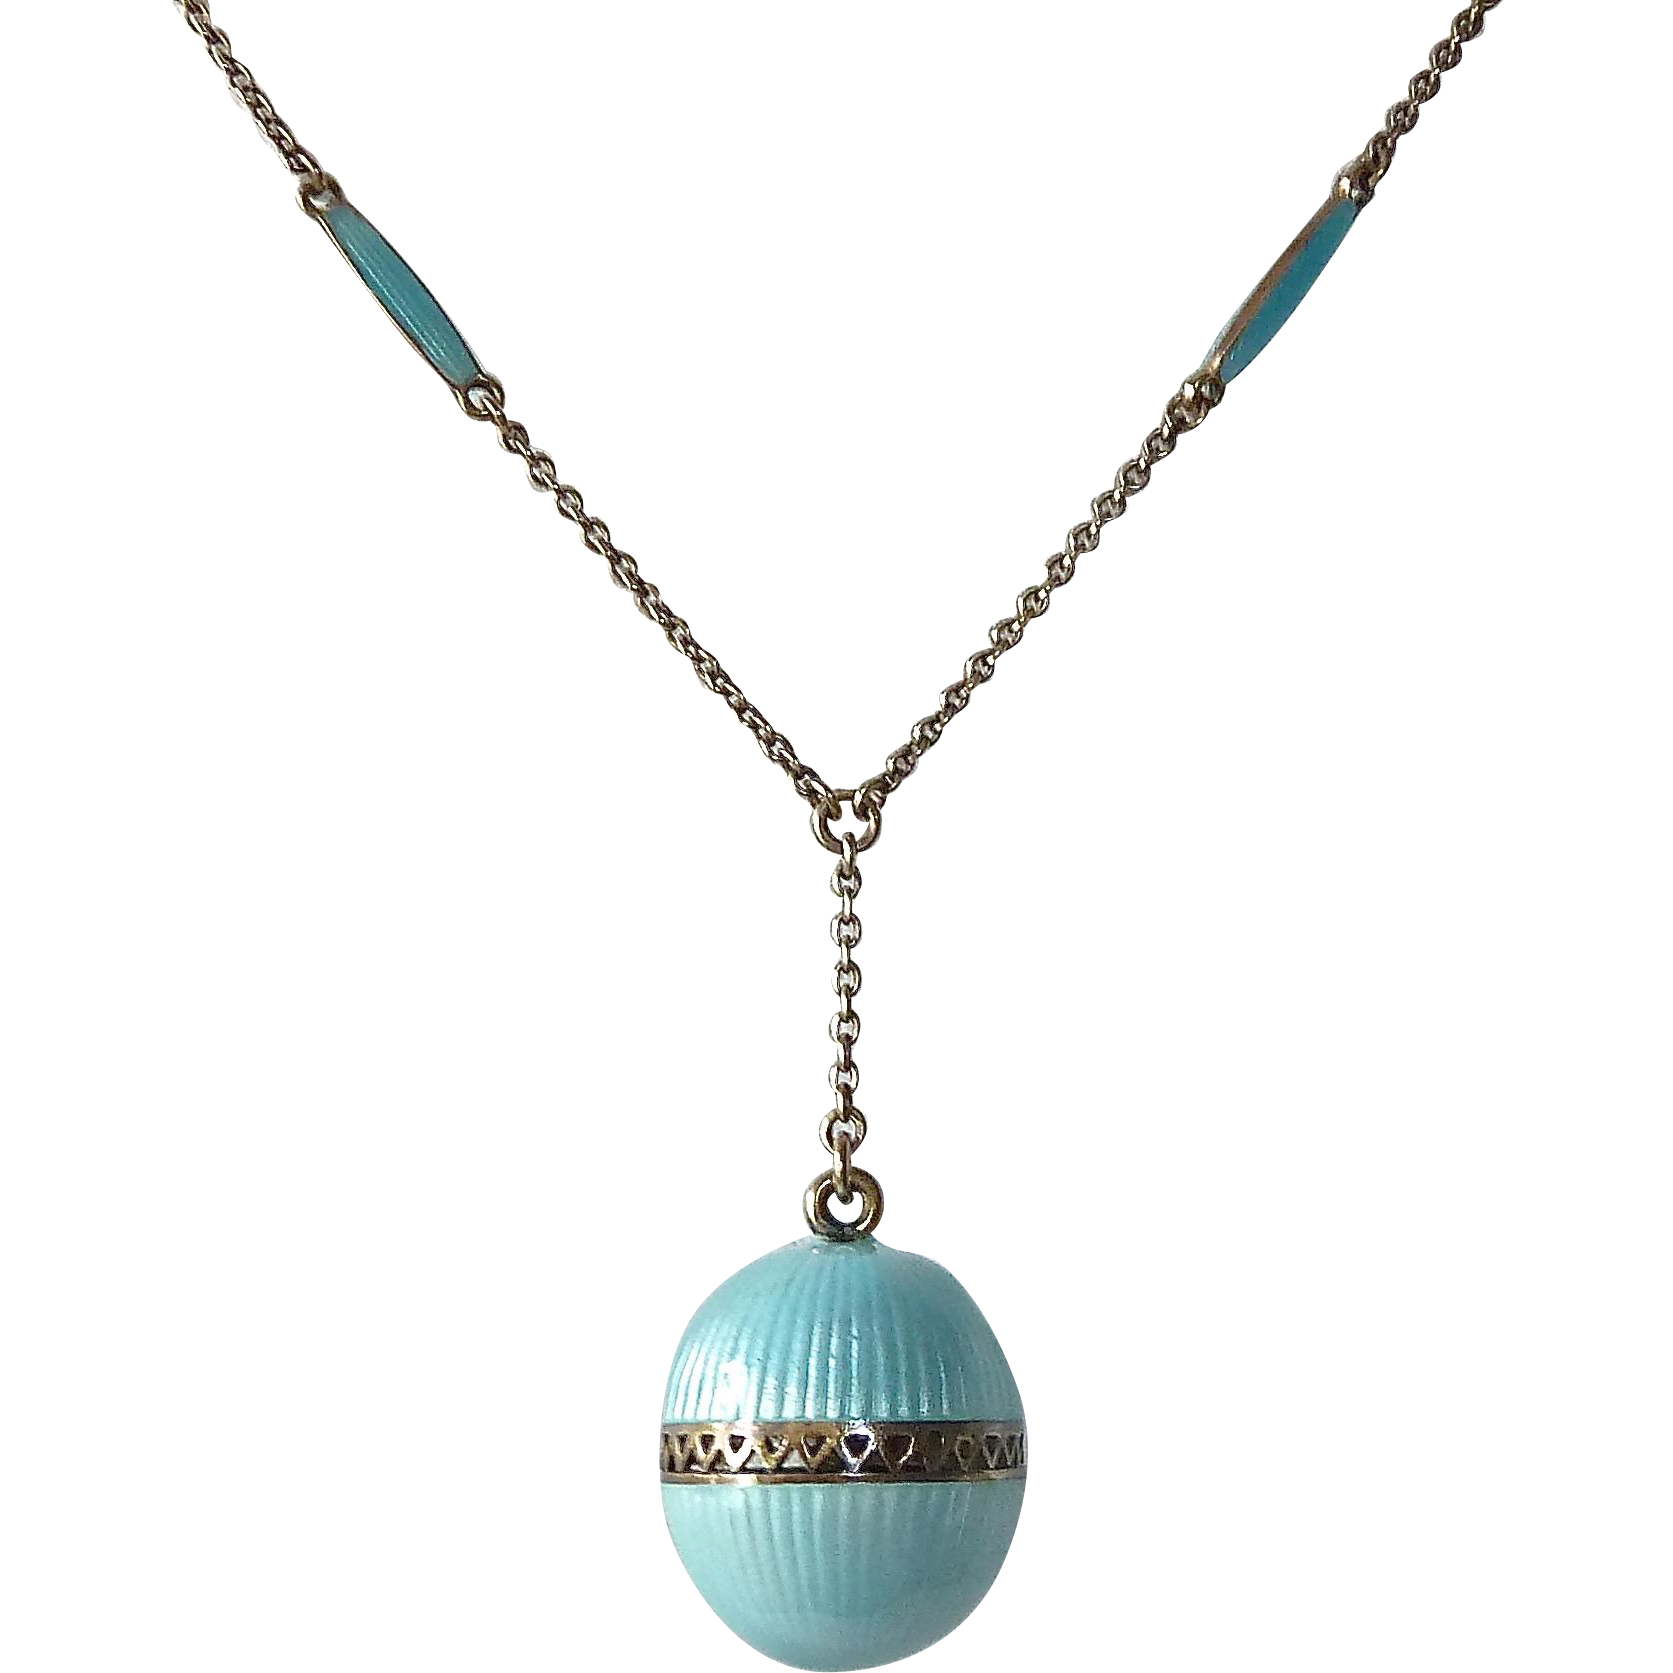 Antique Sterling & Enamel Perfume Vinaigrette Pendant w Original Chain